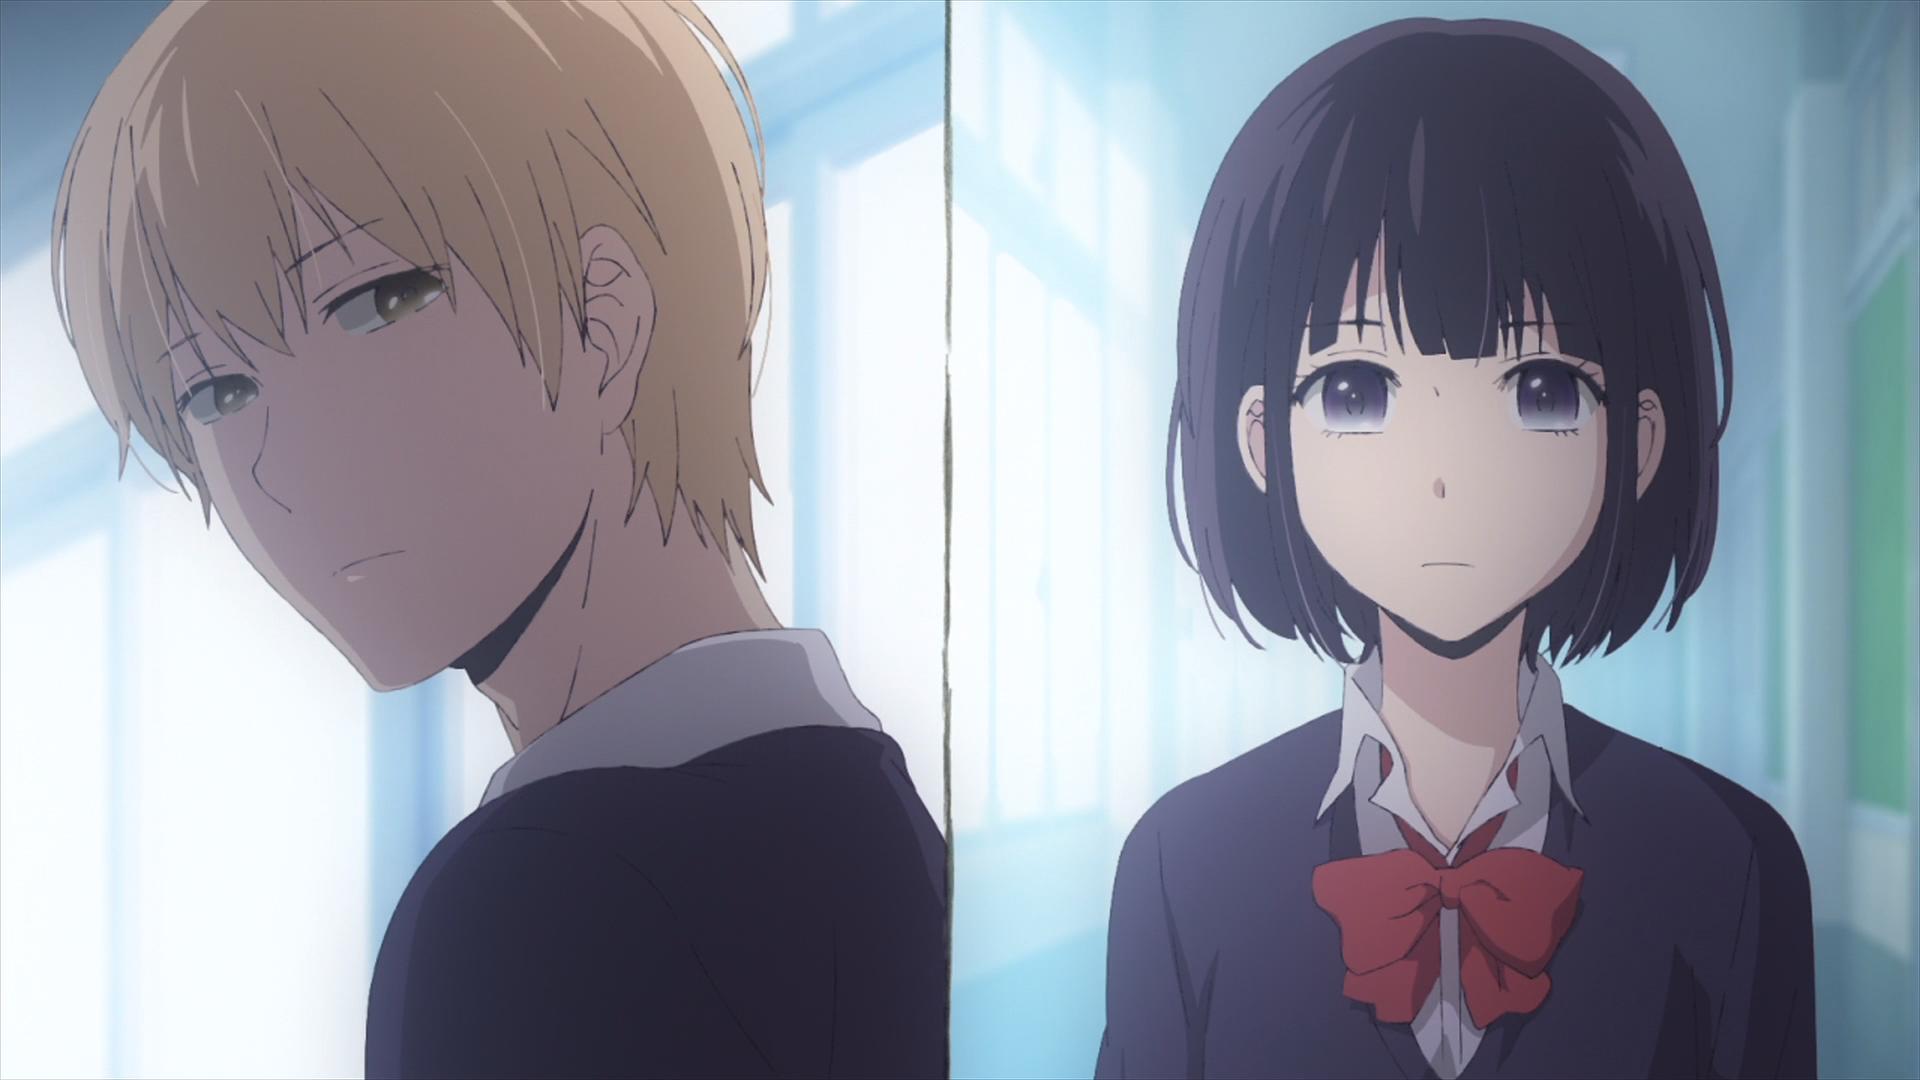 Kuzu No Honkai Episode 1 Mugi And Hanabi Meeting For The First Time